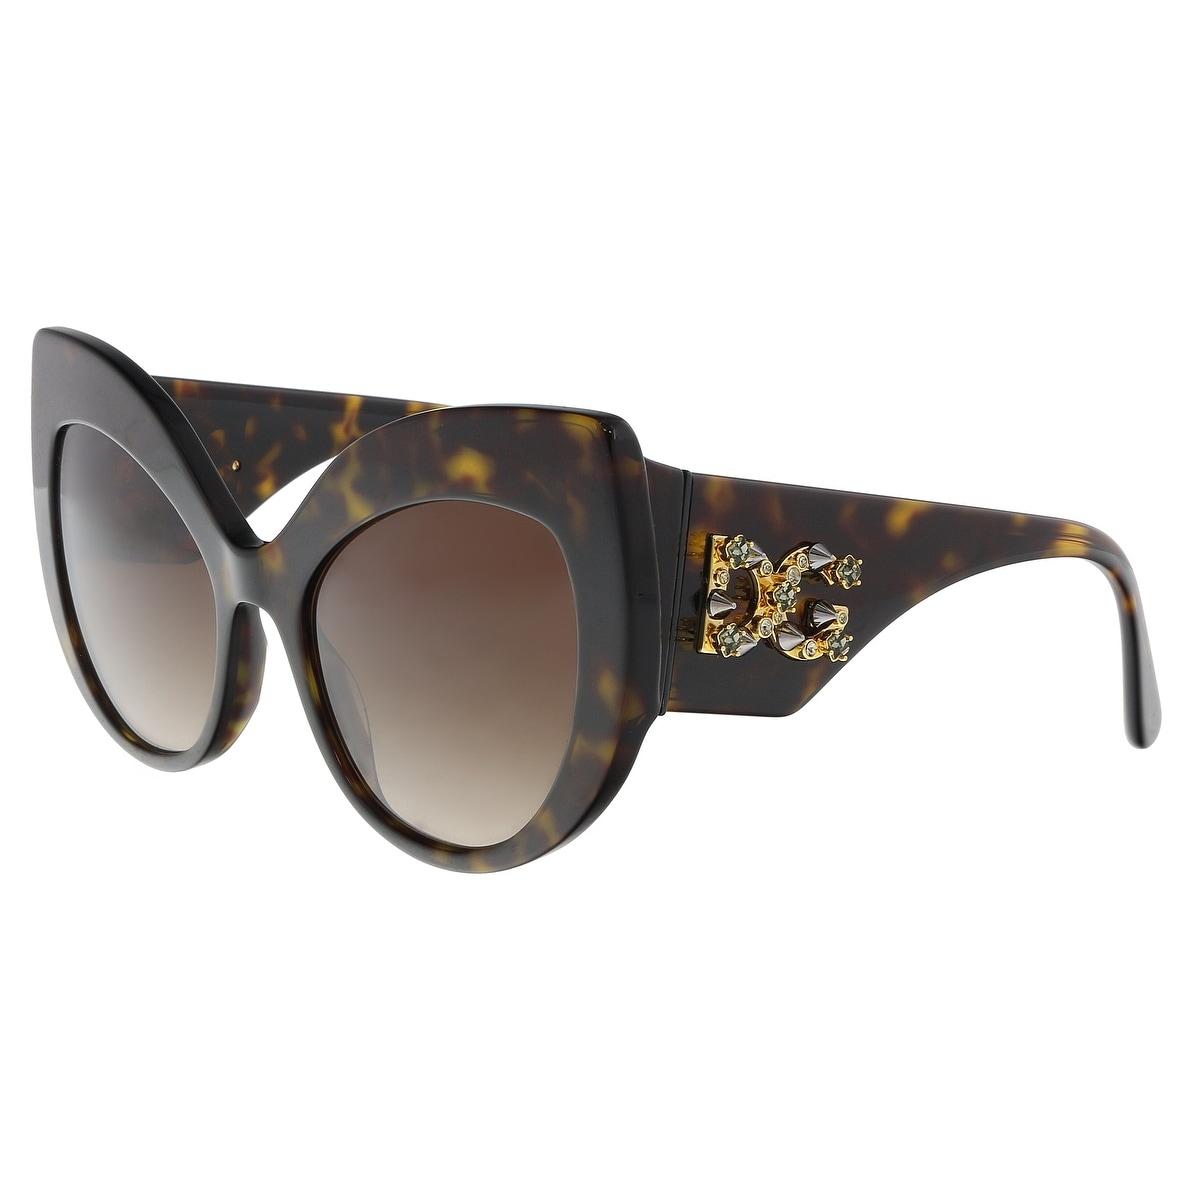 81787ea1ced9 Dolce   Gabbana Women s Sunglasses